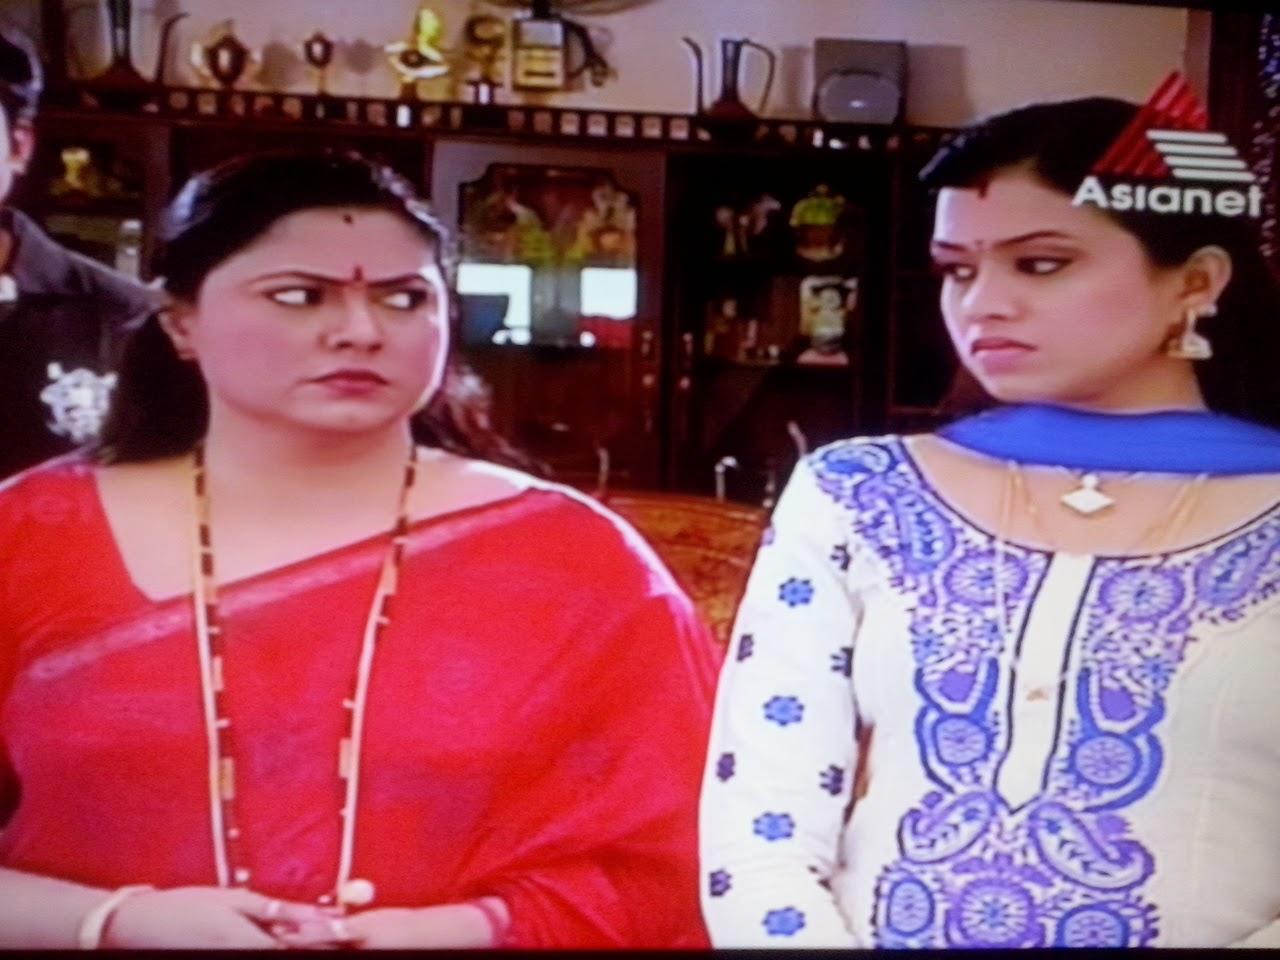 Asianet Serial Sthreedhanam Stills on February 28th Episode